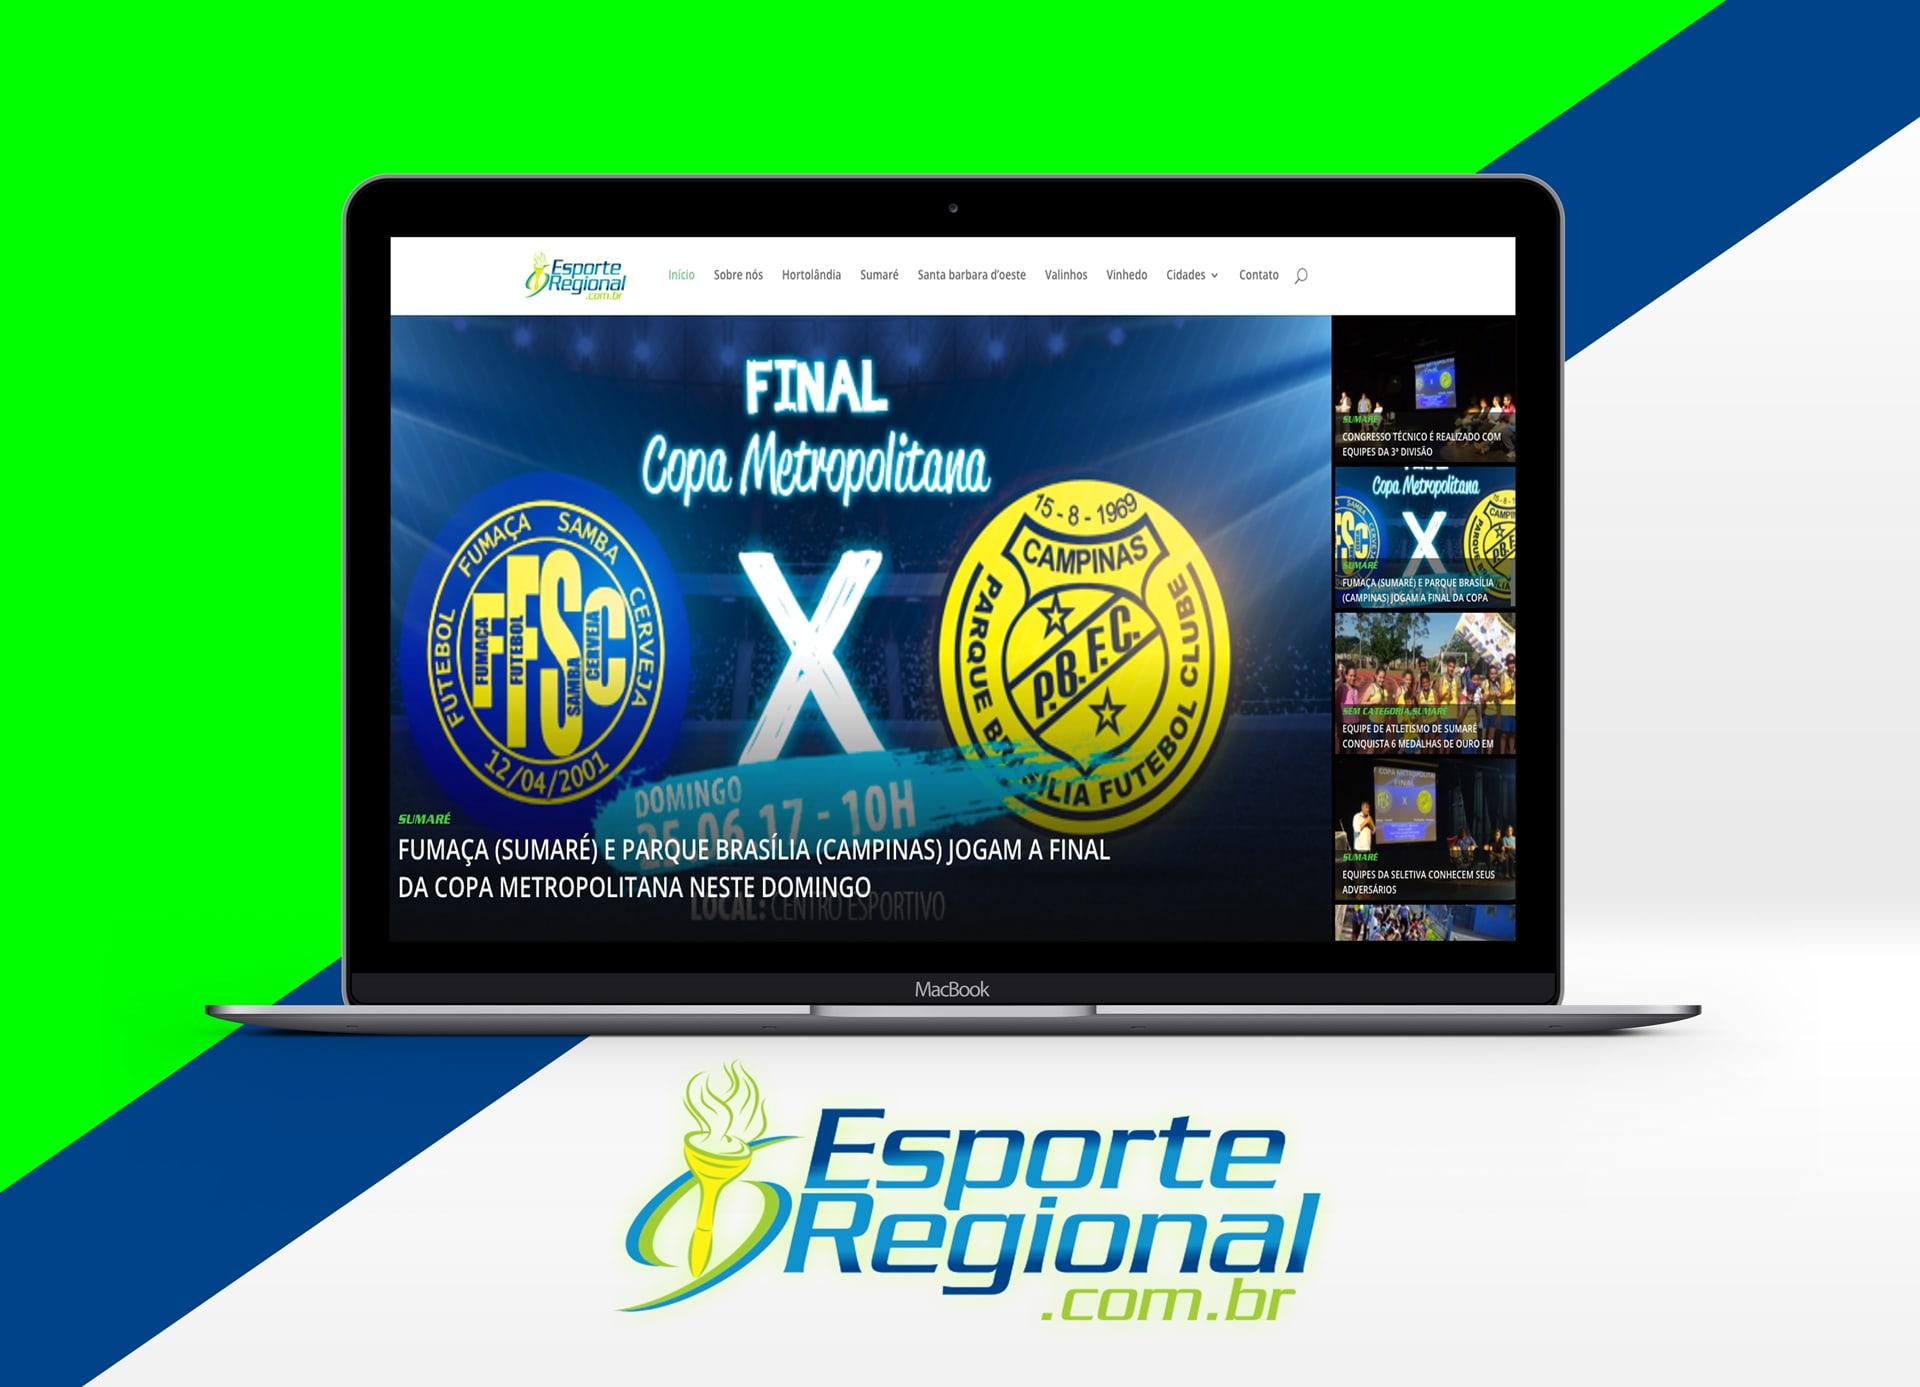 Esporte Regional